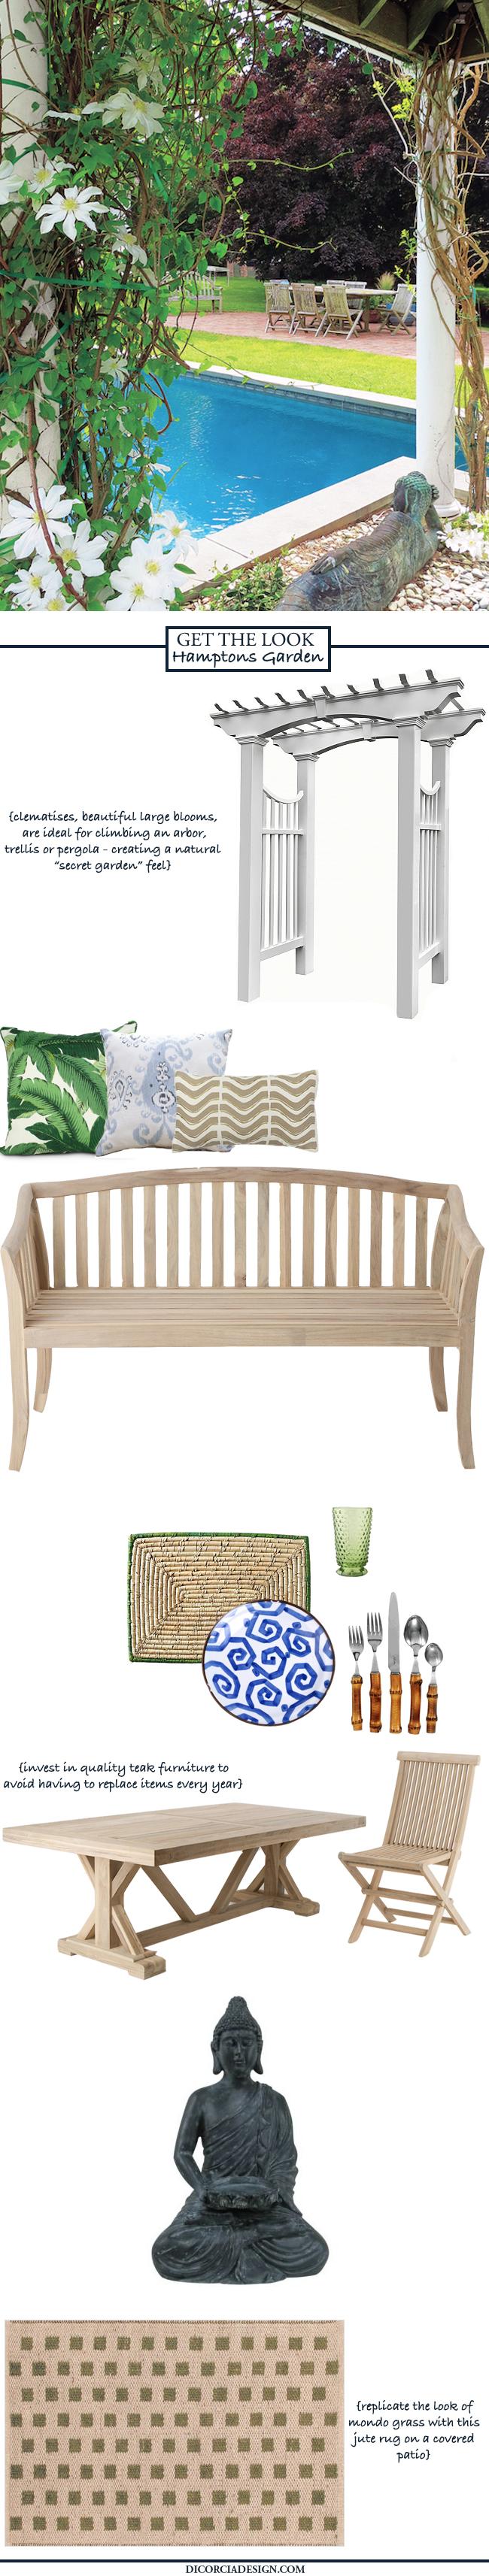 Get-The-Look-Hamptons-Garden-via-DiCorcia-Interior-Design